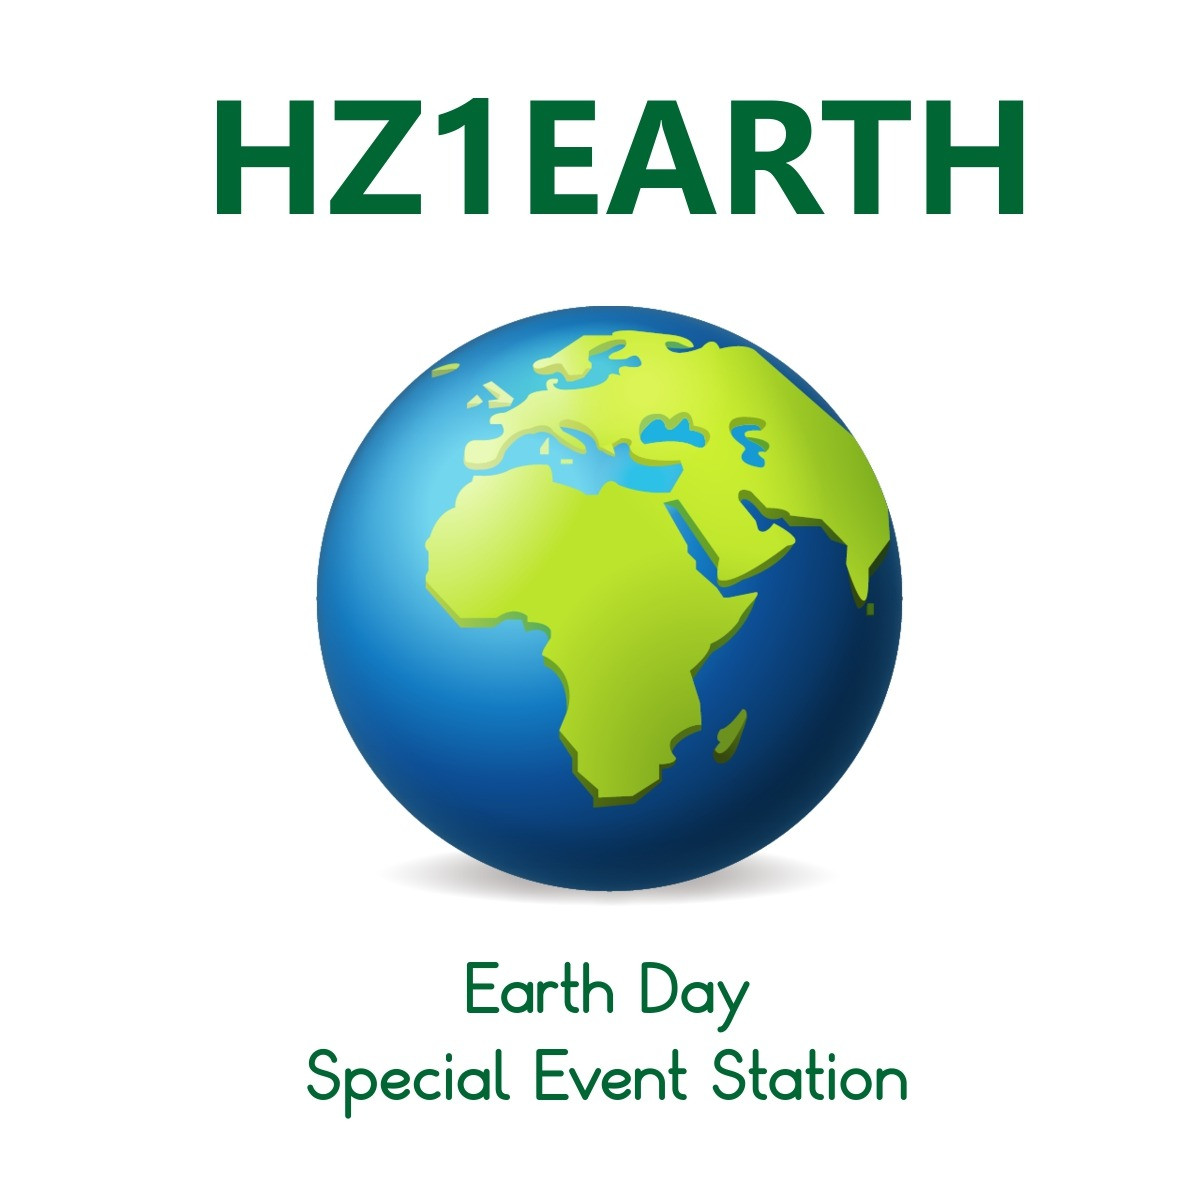 HZ1EARTH Earth Day, Riyadh, Saudi Arabia